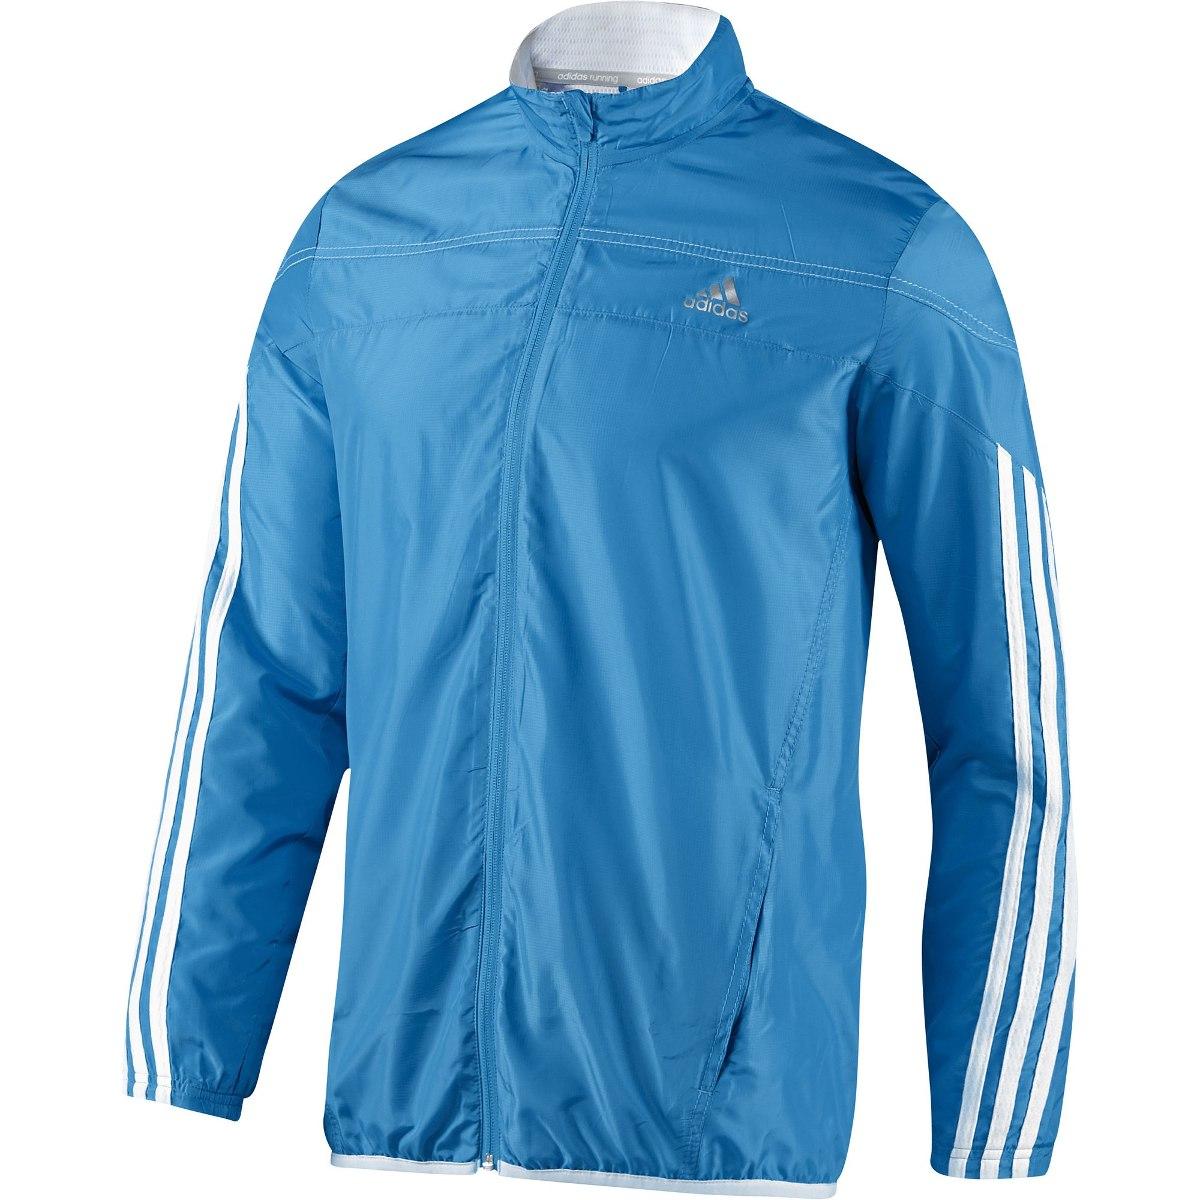 chaqueta adidas argentina wc14 azul